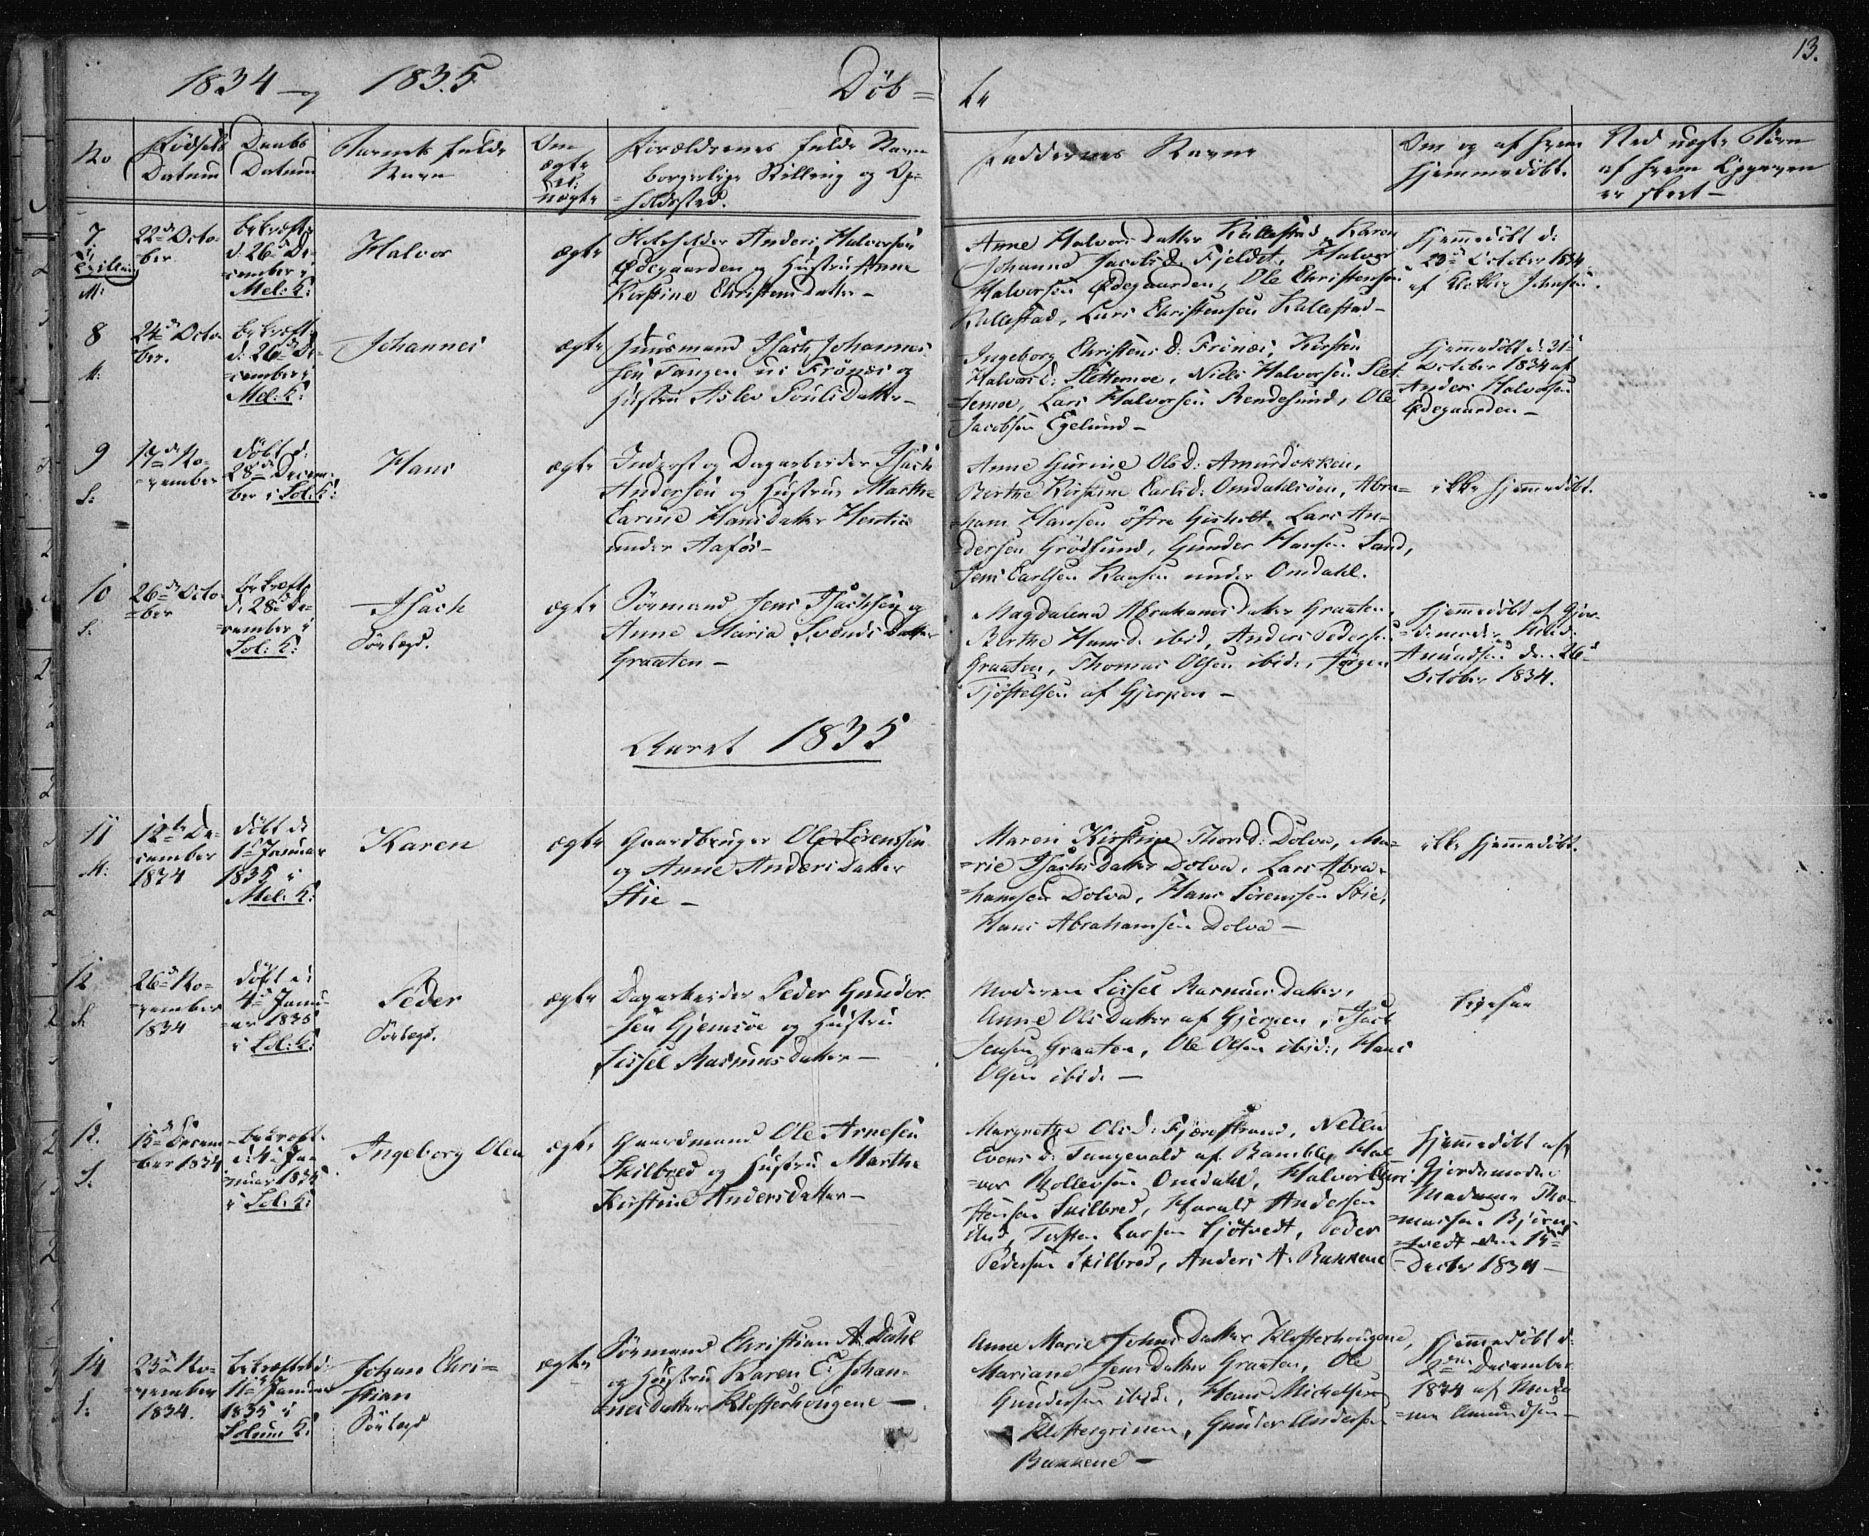 SAKO, Solum kirkebøker, F/Fa/L0005: Ministerialbok nr. I 5, 1833-1843, s. 13